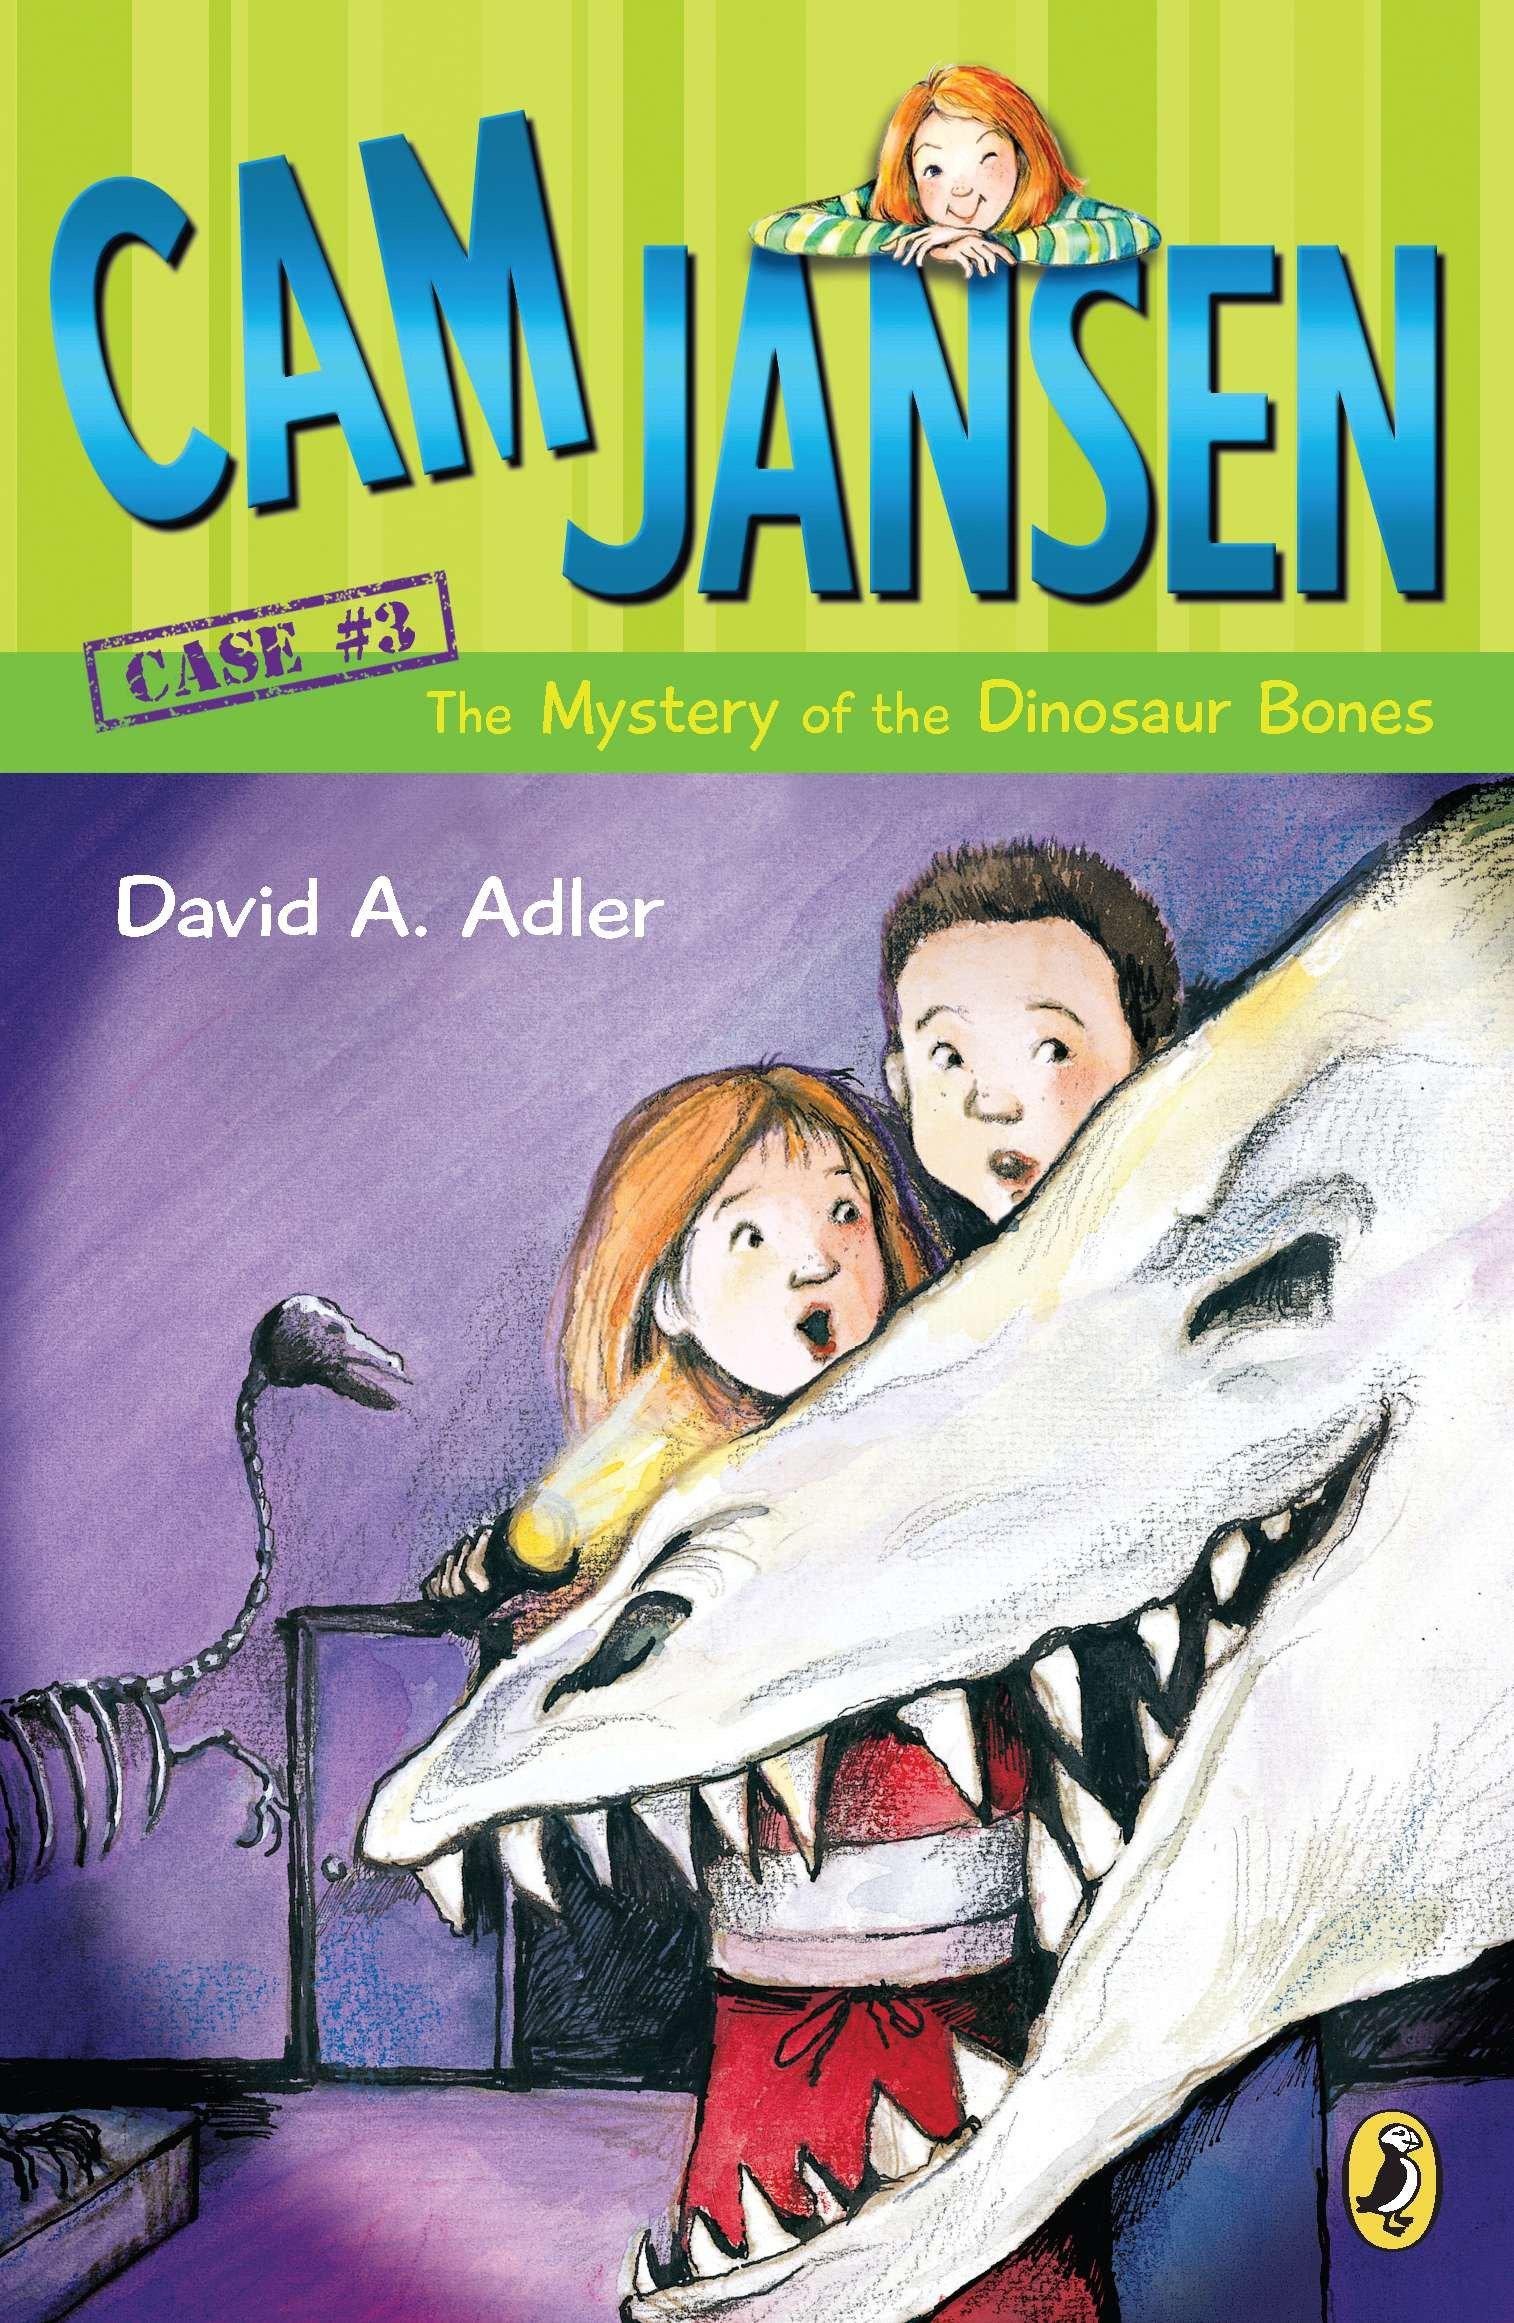 Cam Jansen: The Mystery of the Dinosaur Bones #3